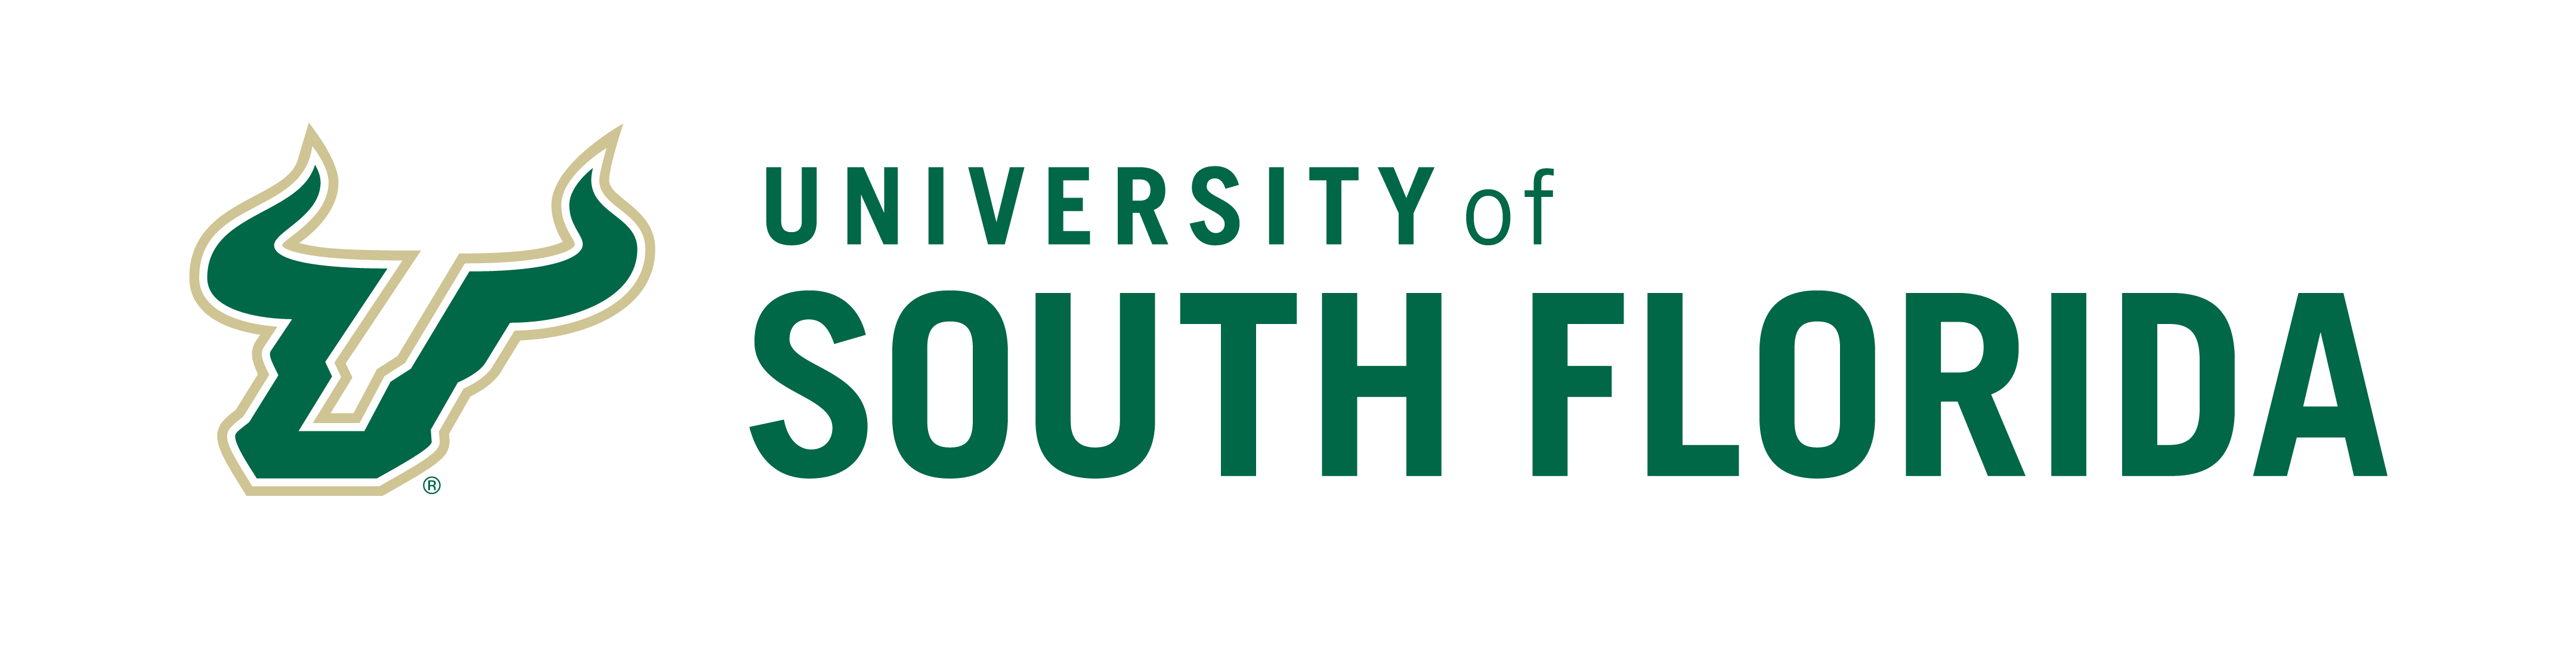 Usf Academic Calendar 2022 2023.Pathology Outlines Fellowships